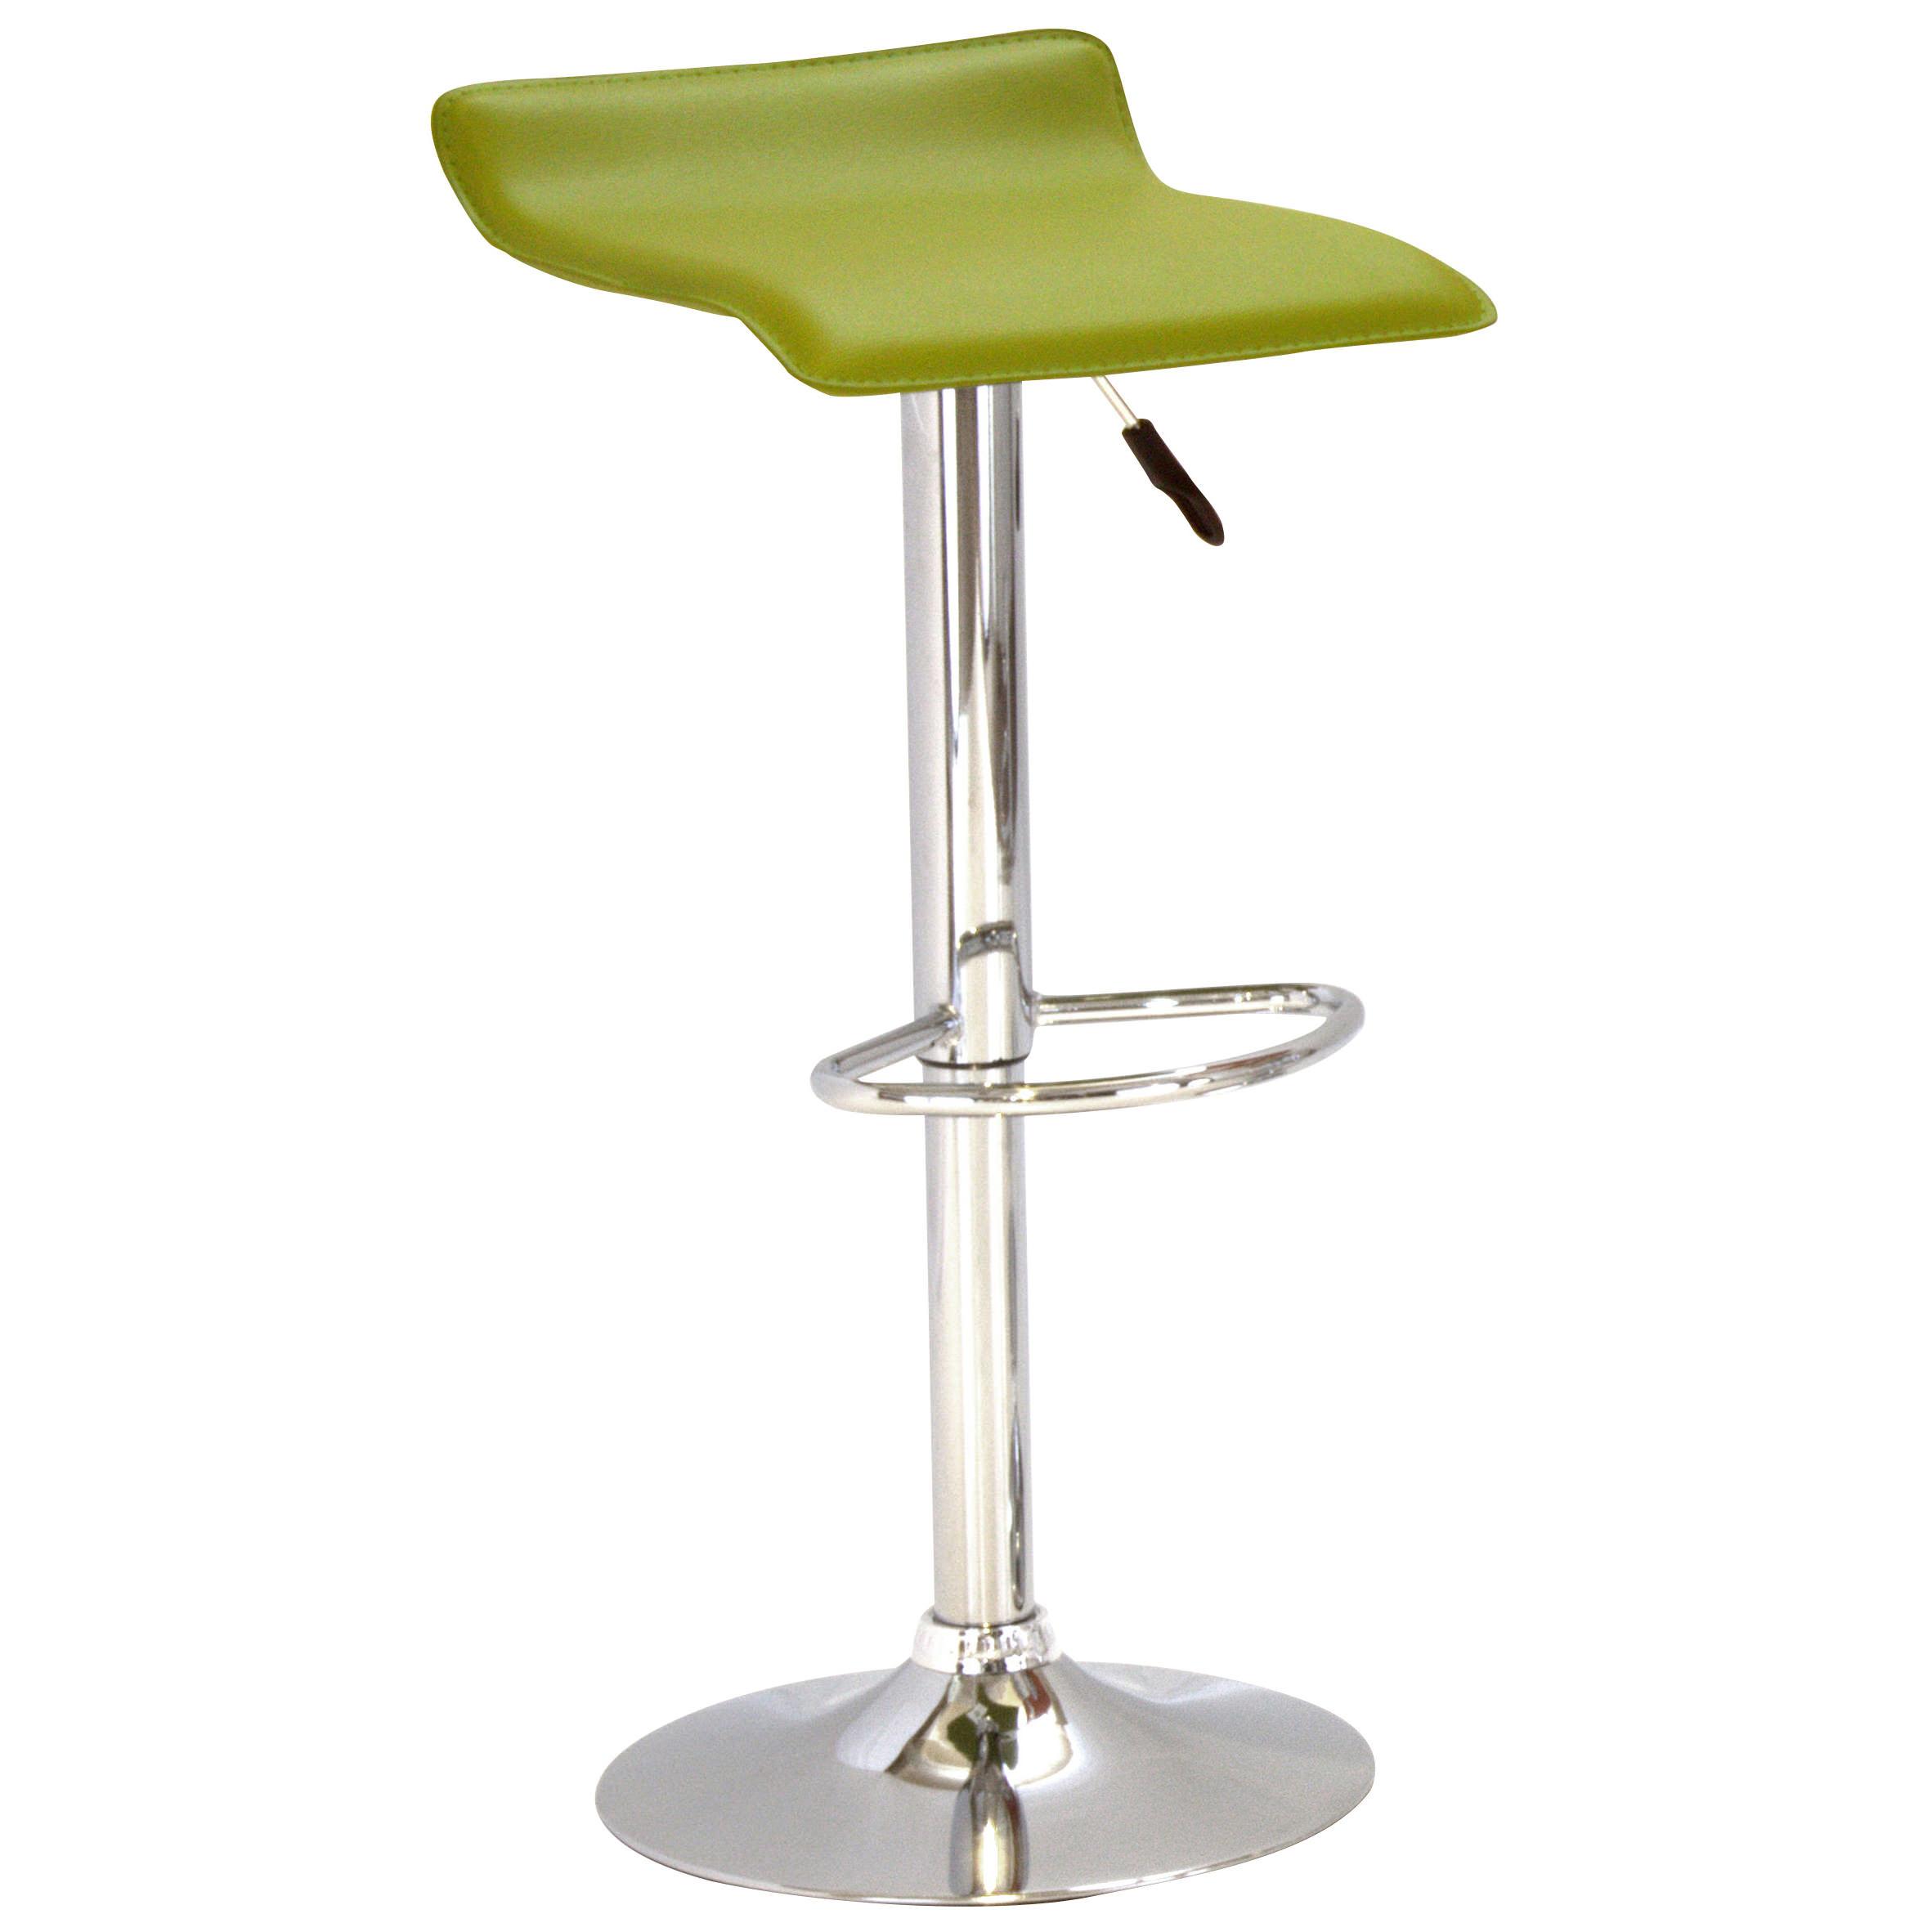 Green Kitchen Stools: 2x Kitchen Breakfast Bar Stool Seat Barstool